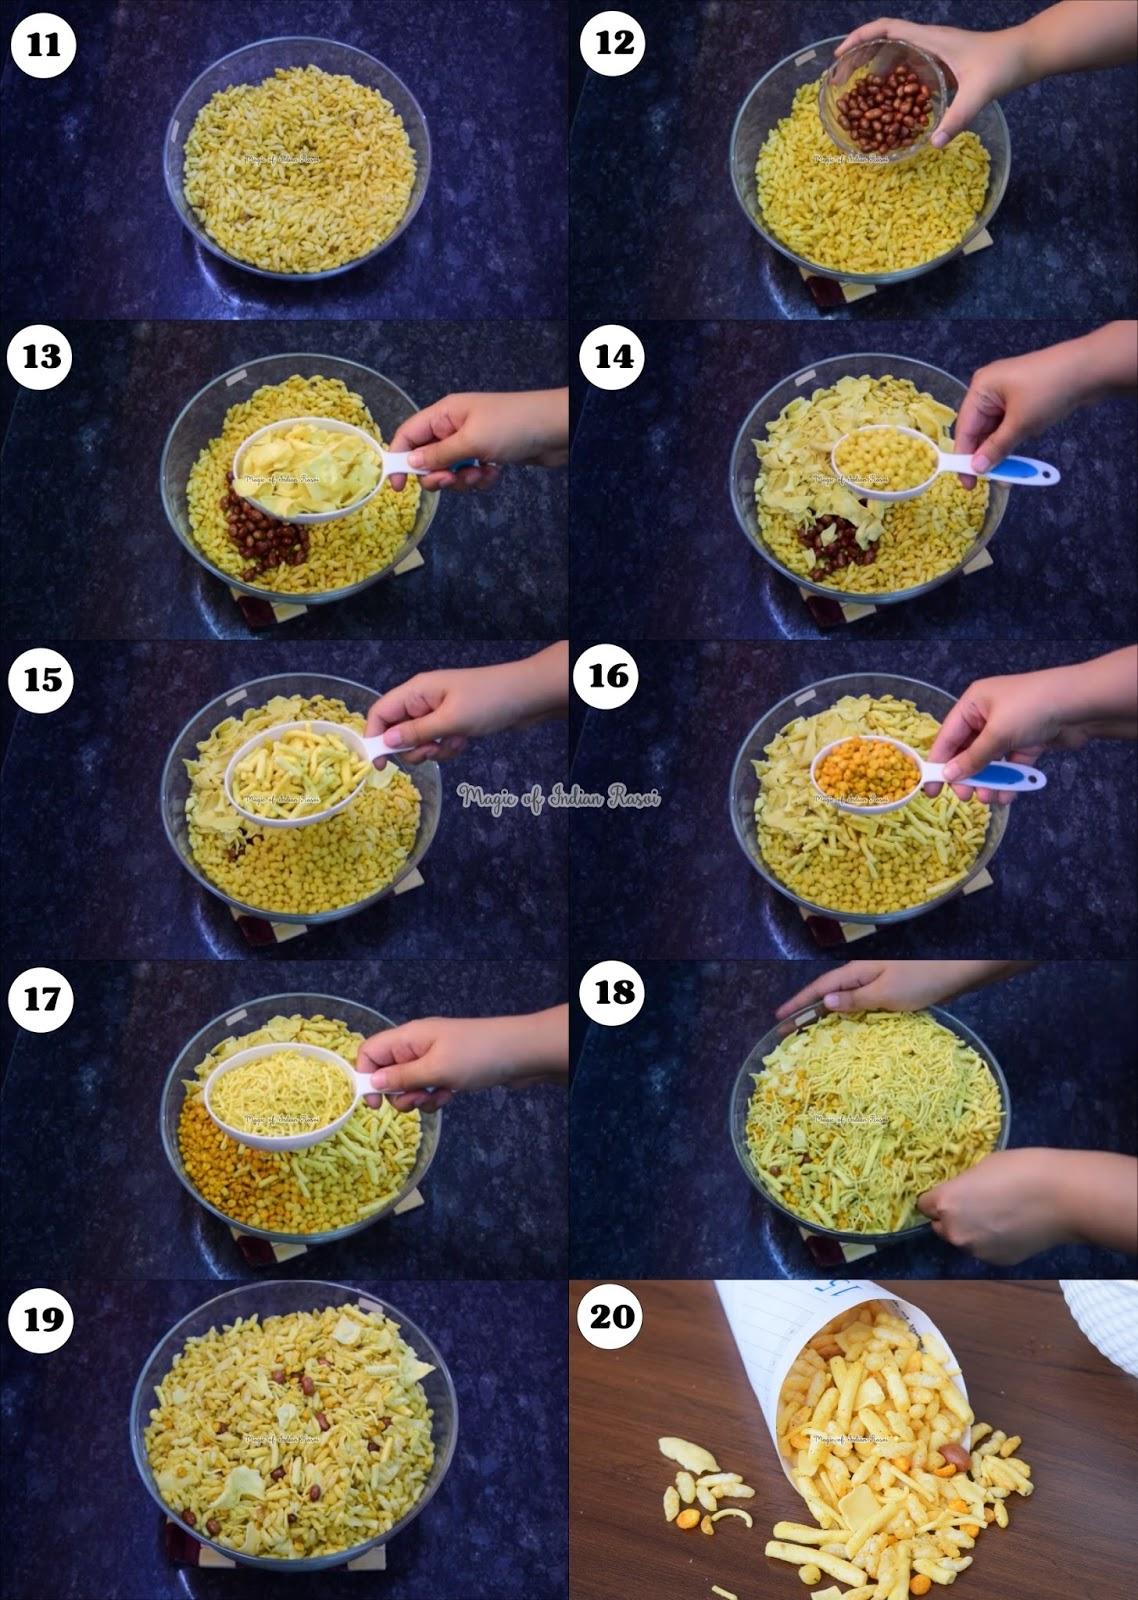 Homemade Murmura Bhel Puri Mix - Bhel Mamra Mix Recipe - मुरमुरा भेल पूरी मिक्स की रेसिपी  - Priya R - Magic of Indian Rasoi